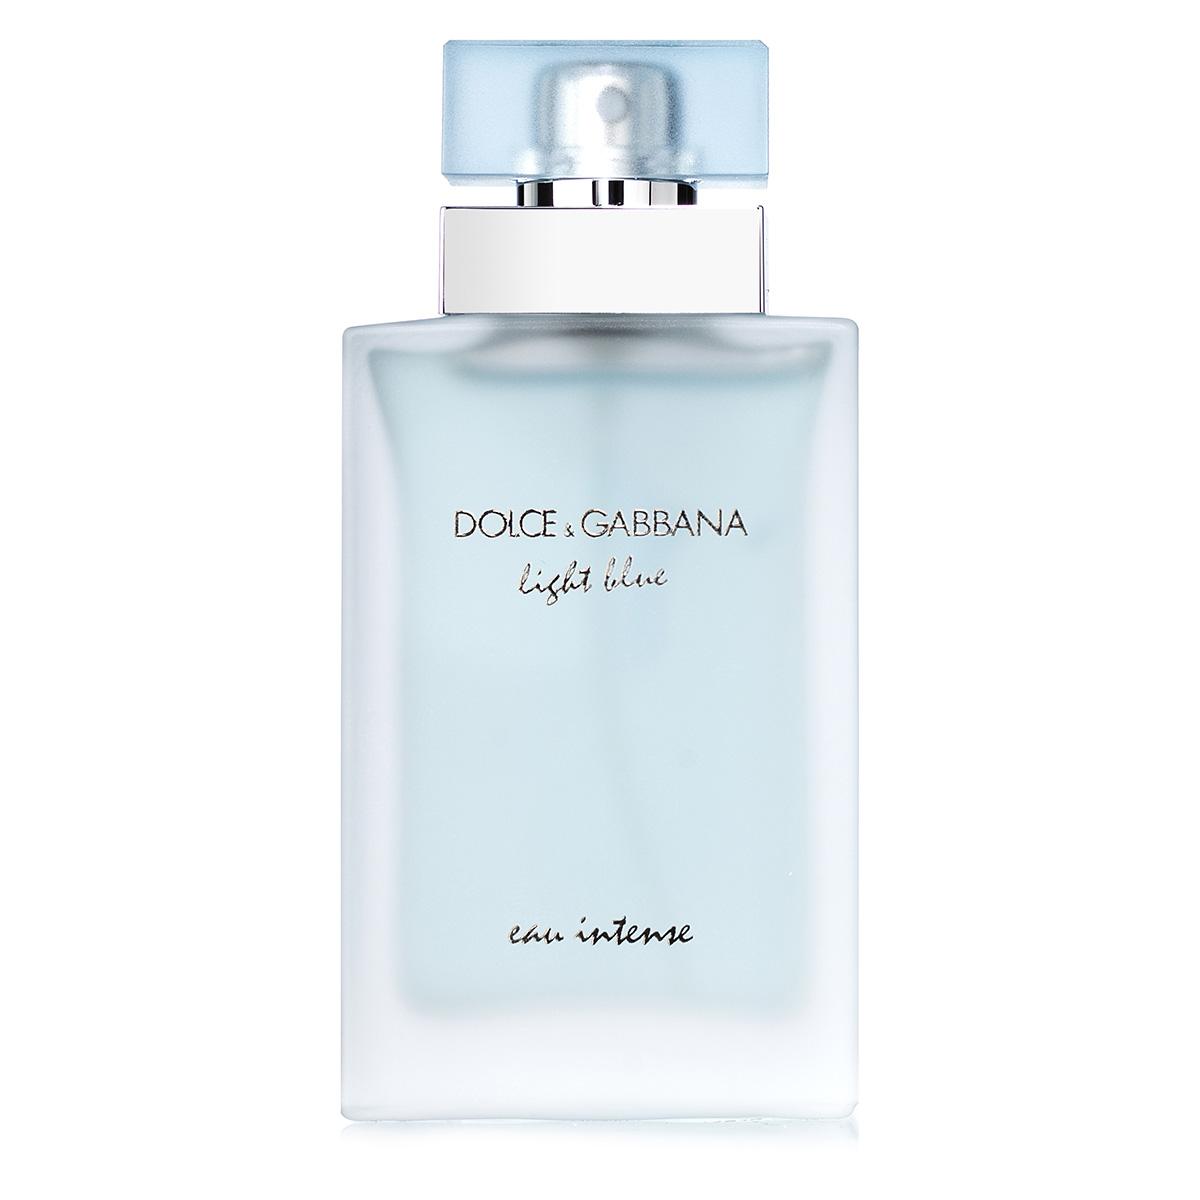 Dolce & Gabbana Light Blue Eau Intense Pour Femme EdP - 25 ml